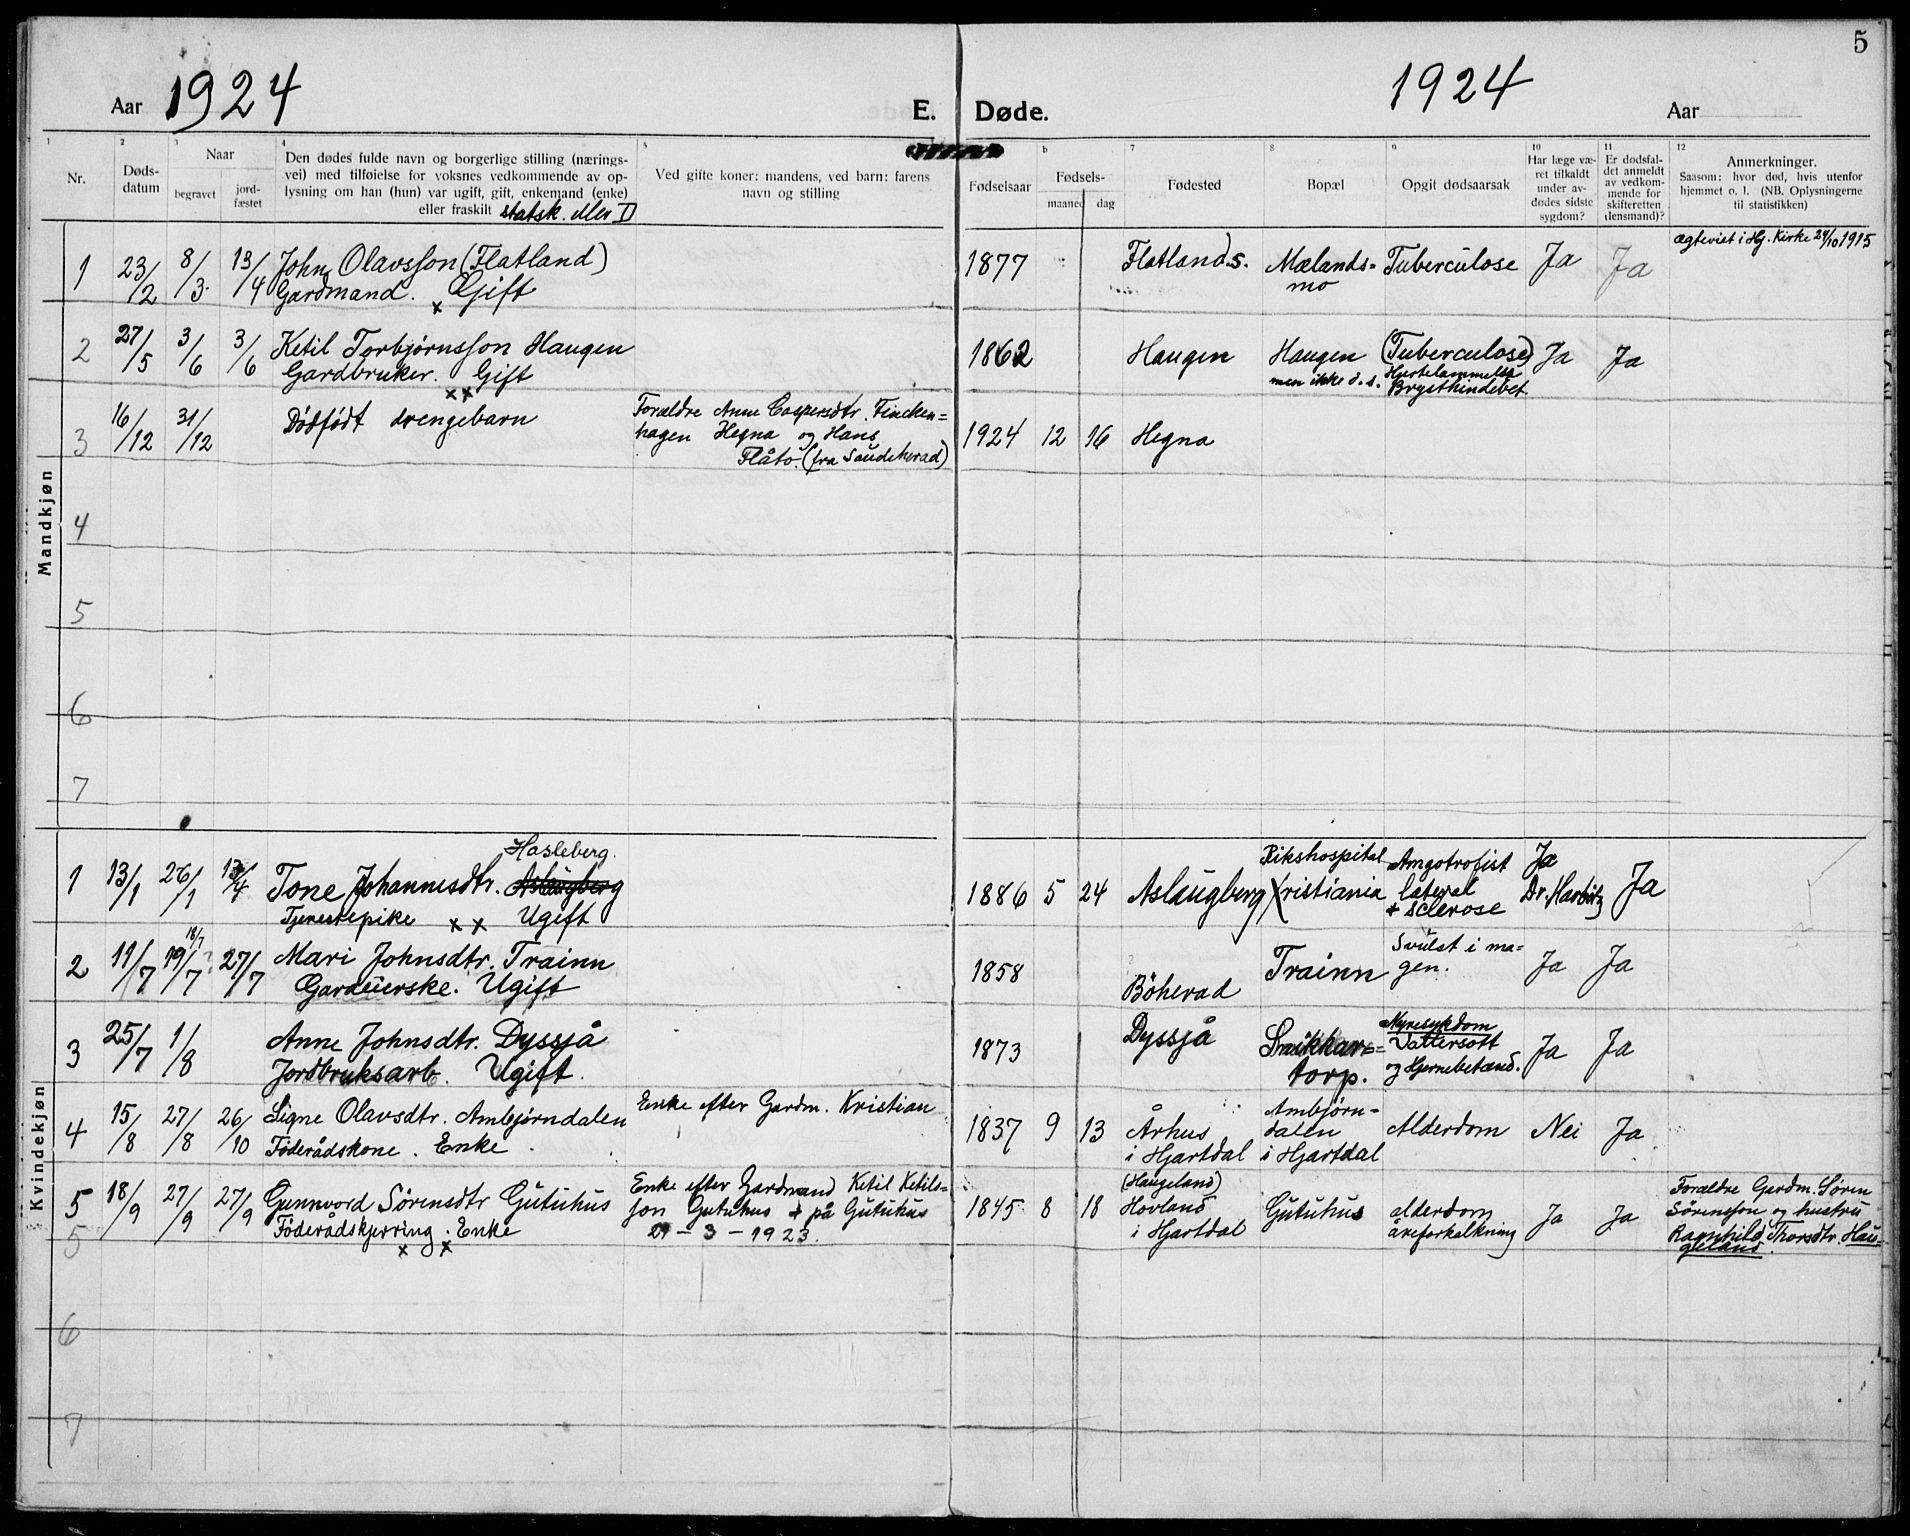 SAKO, Hjartdal kirkebøker, F/Fa/L0012: Ministerialbok nr. I 12, 1923-1930, s. 5